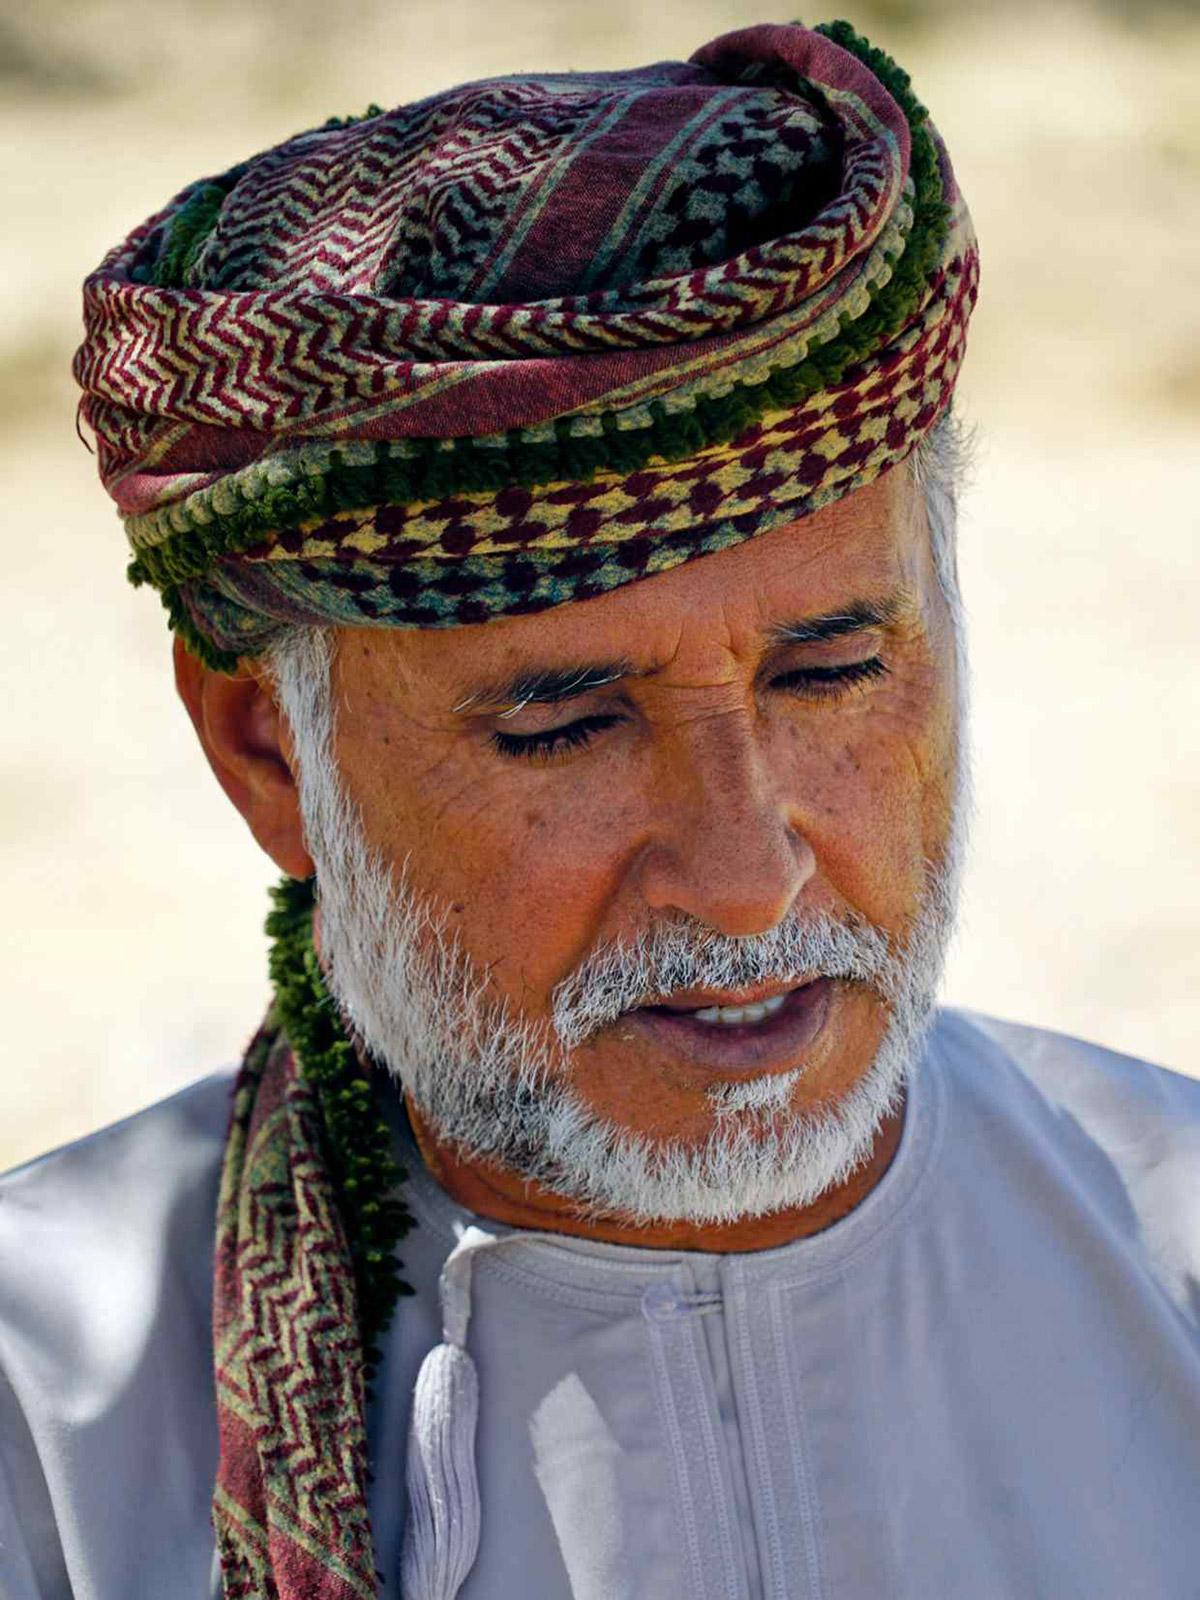 Local Bedu guide Mussallem Al Mahri | Image: Pelorus